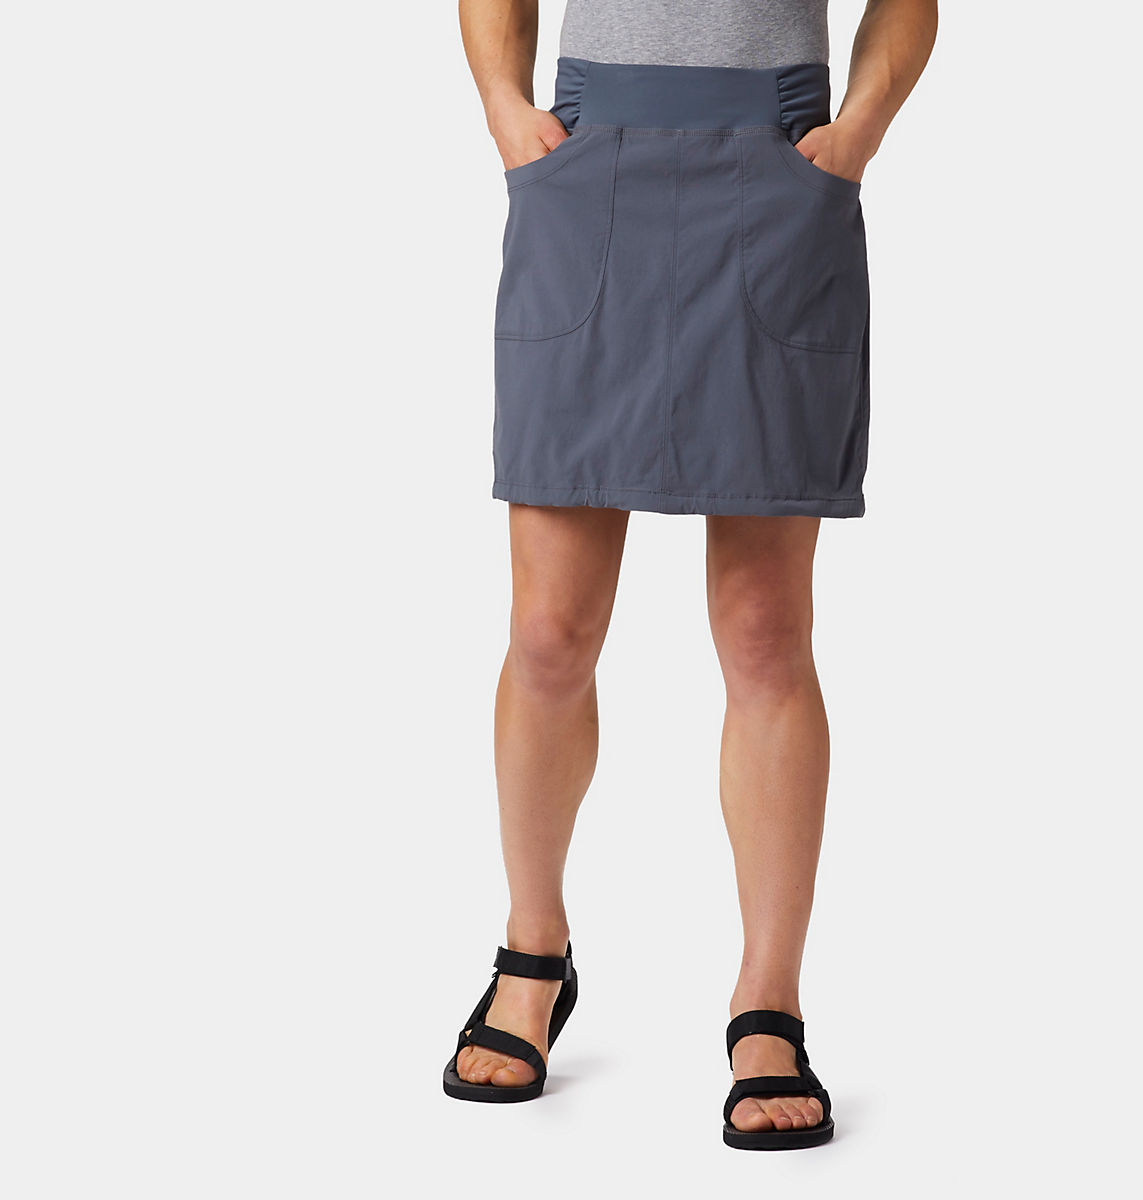 Mountain Hardwear Women/'s Dynama Skirt for Trekking and Everyday Hiking